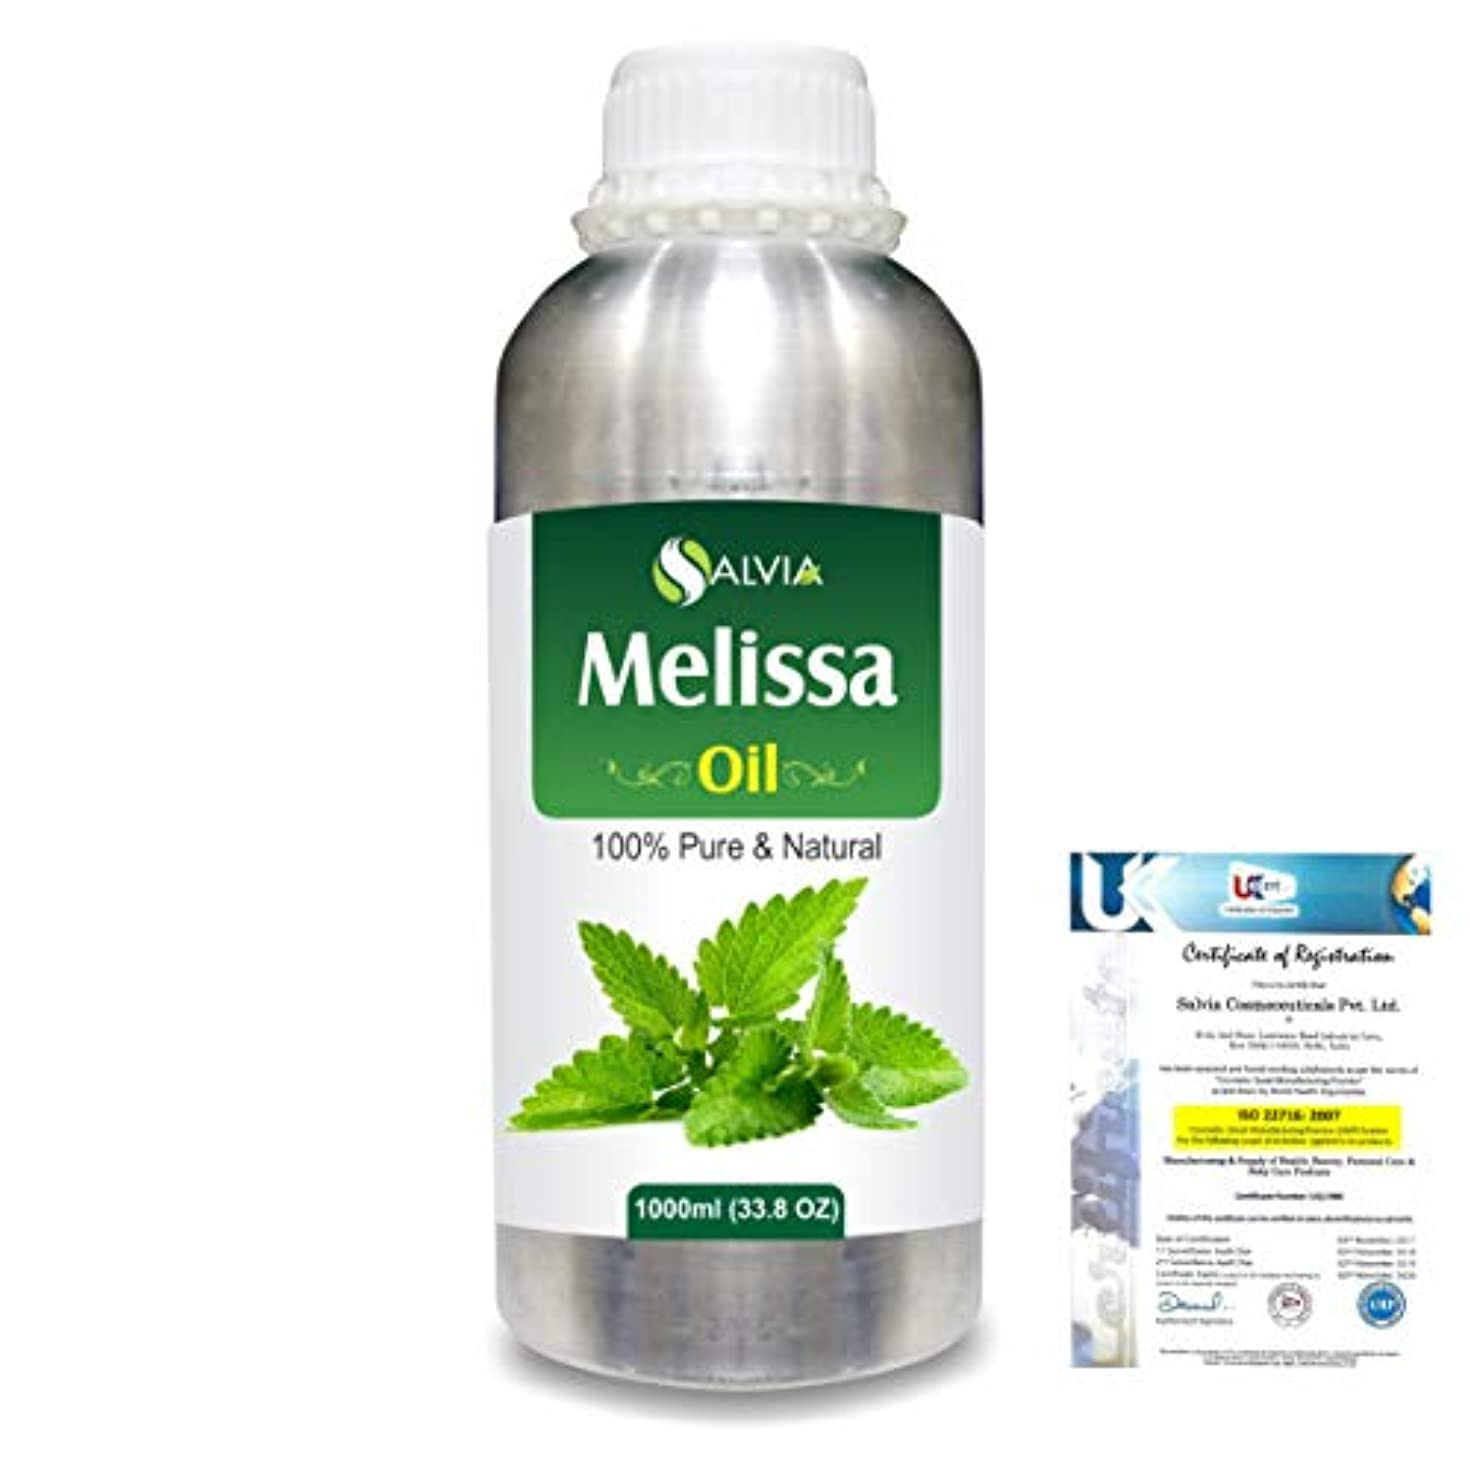 Melissa (Melissa officinalis) 100% Natural Pure Essential Oil 1000ml/33.8fl.oz.